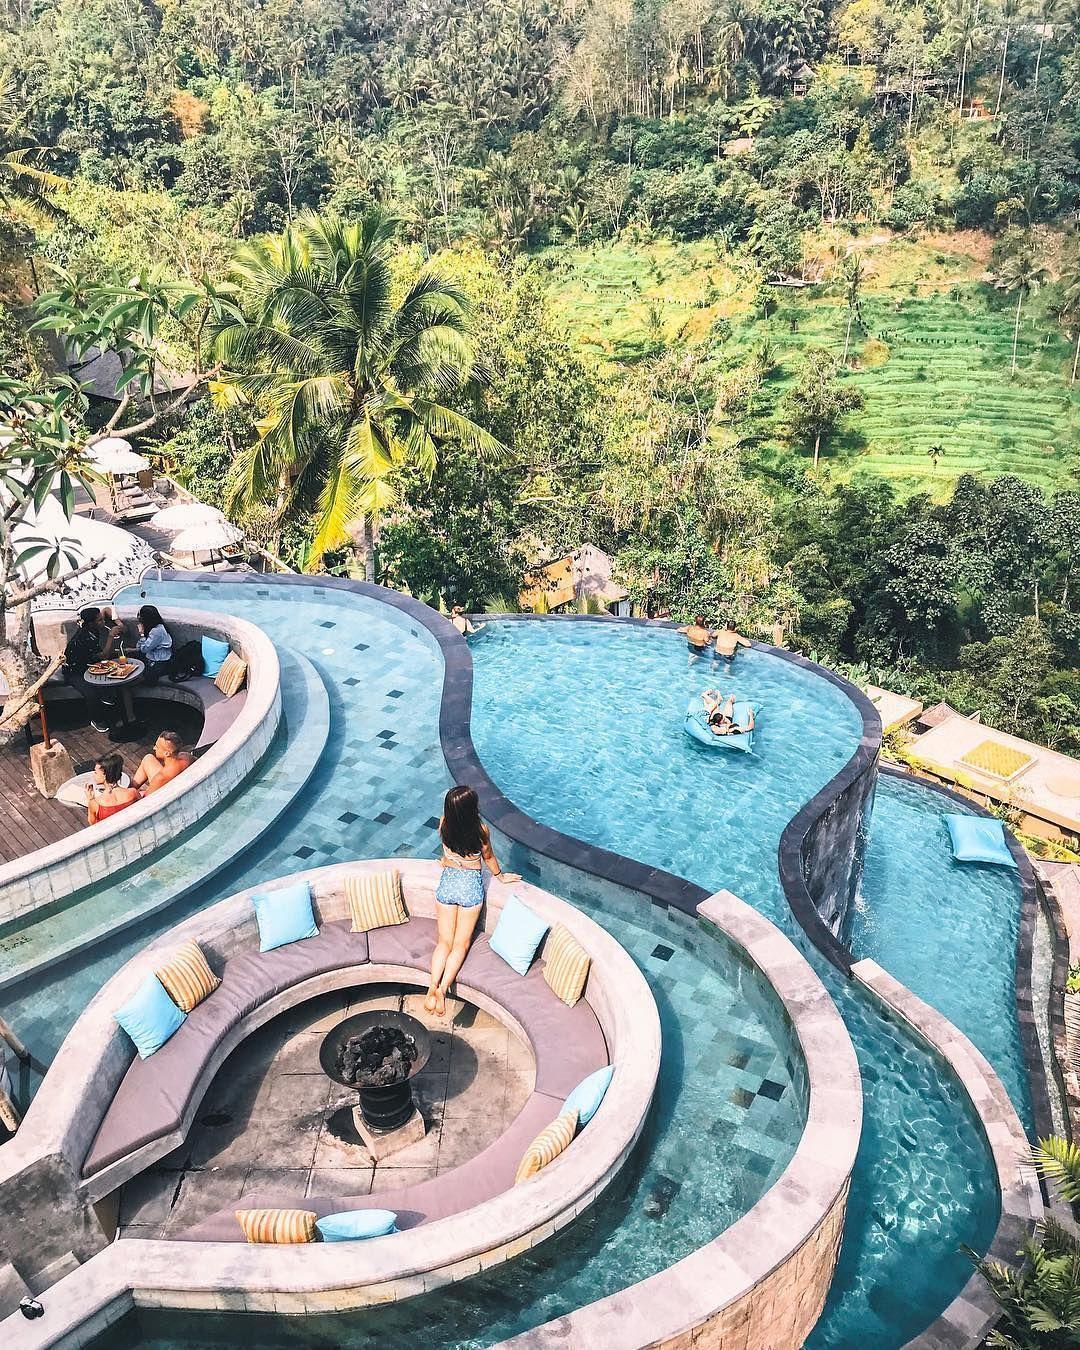 Thebalibible Bali Balinea Balibaris Bali Carte Bali Hotel Bali Body Bali Voyage Bali Indonesie Bali Ubud Bali Meteo Ba Volcan Bali Claire S Boursier